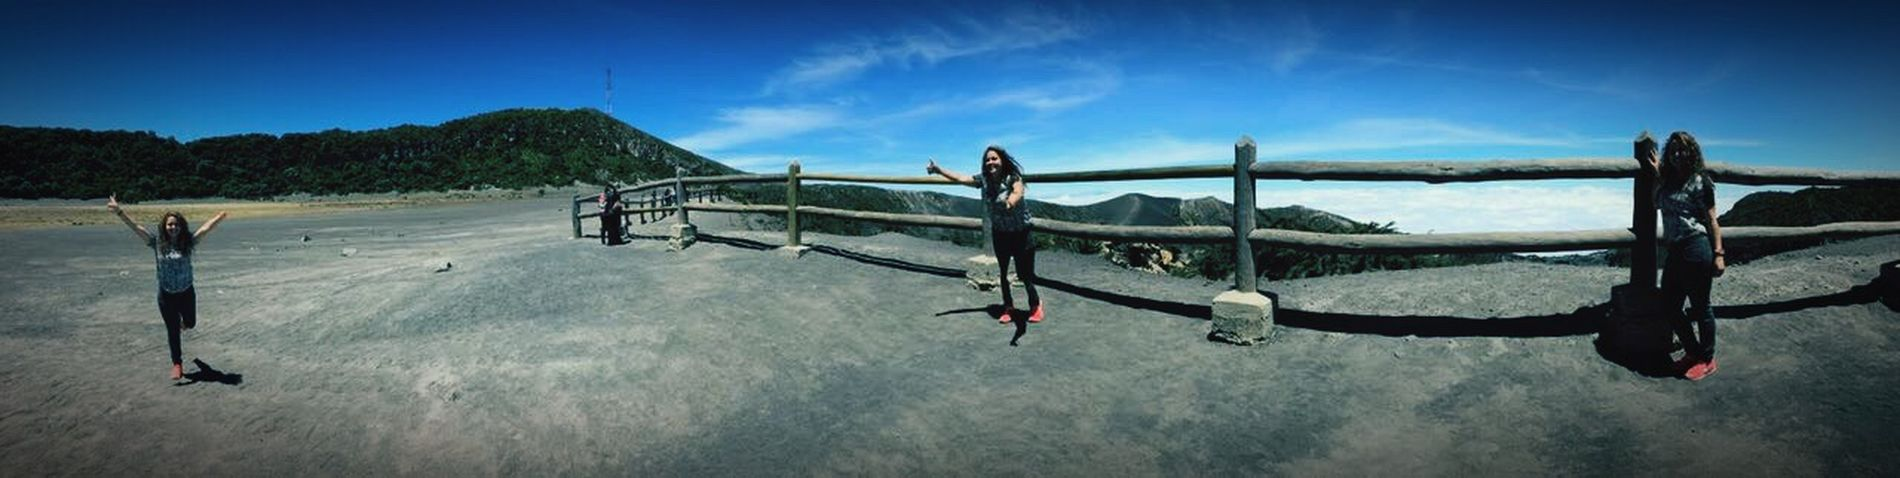 Costa Rica Volcano The Great Outdoors - 2016 EyeEm Awards Kdbe